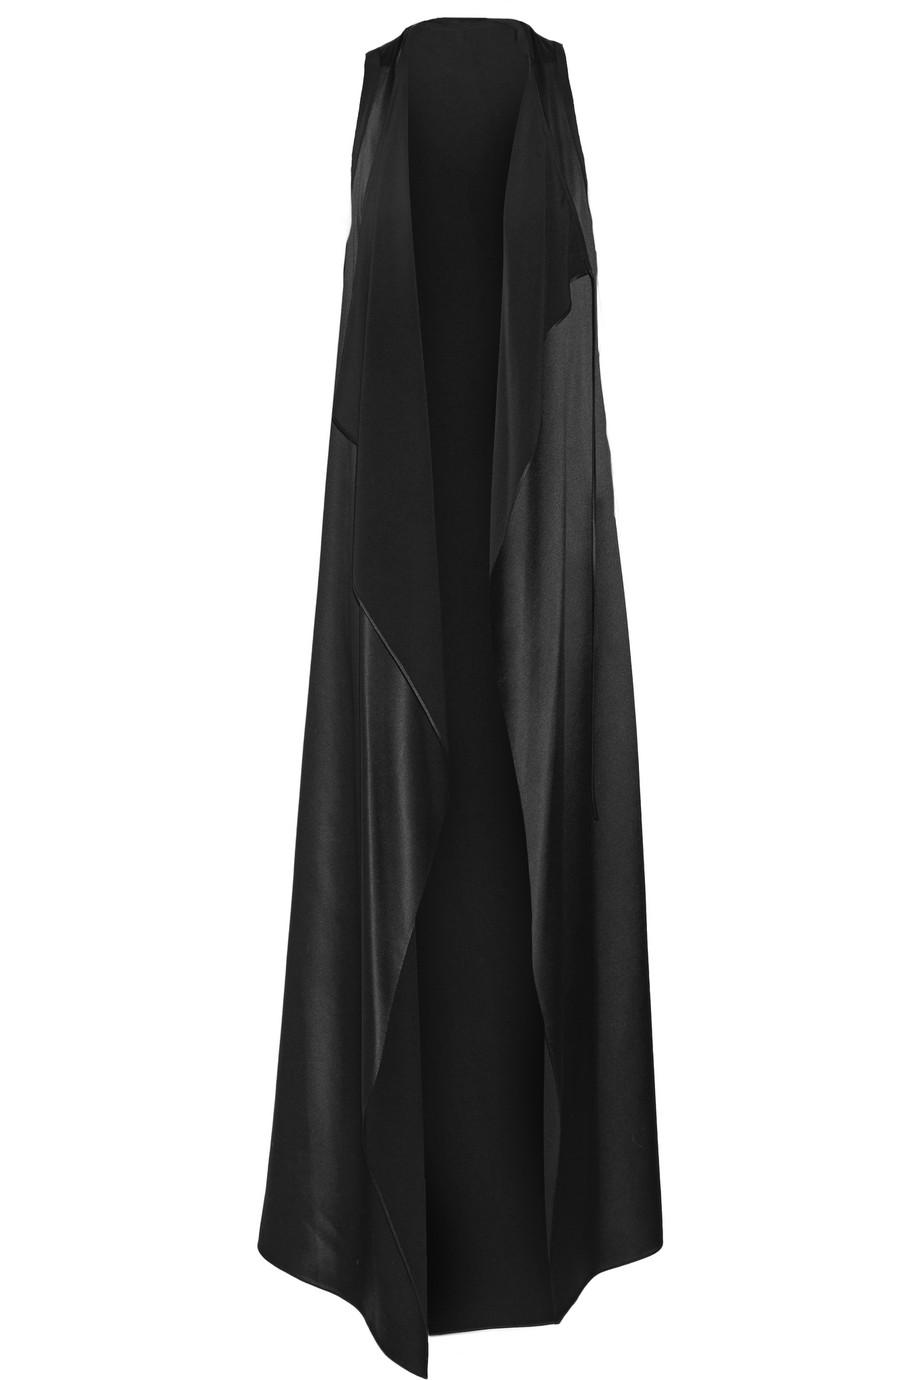 Marfa Silk-Satin Vest, Black, Women's, Size: 2